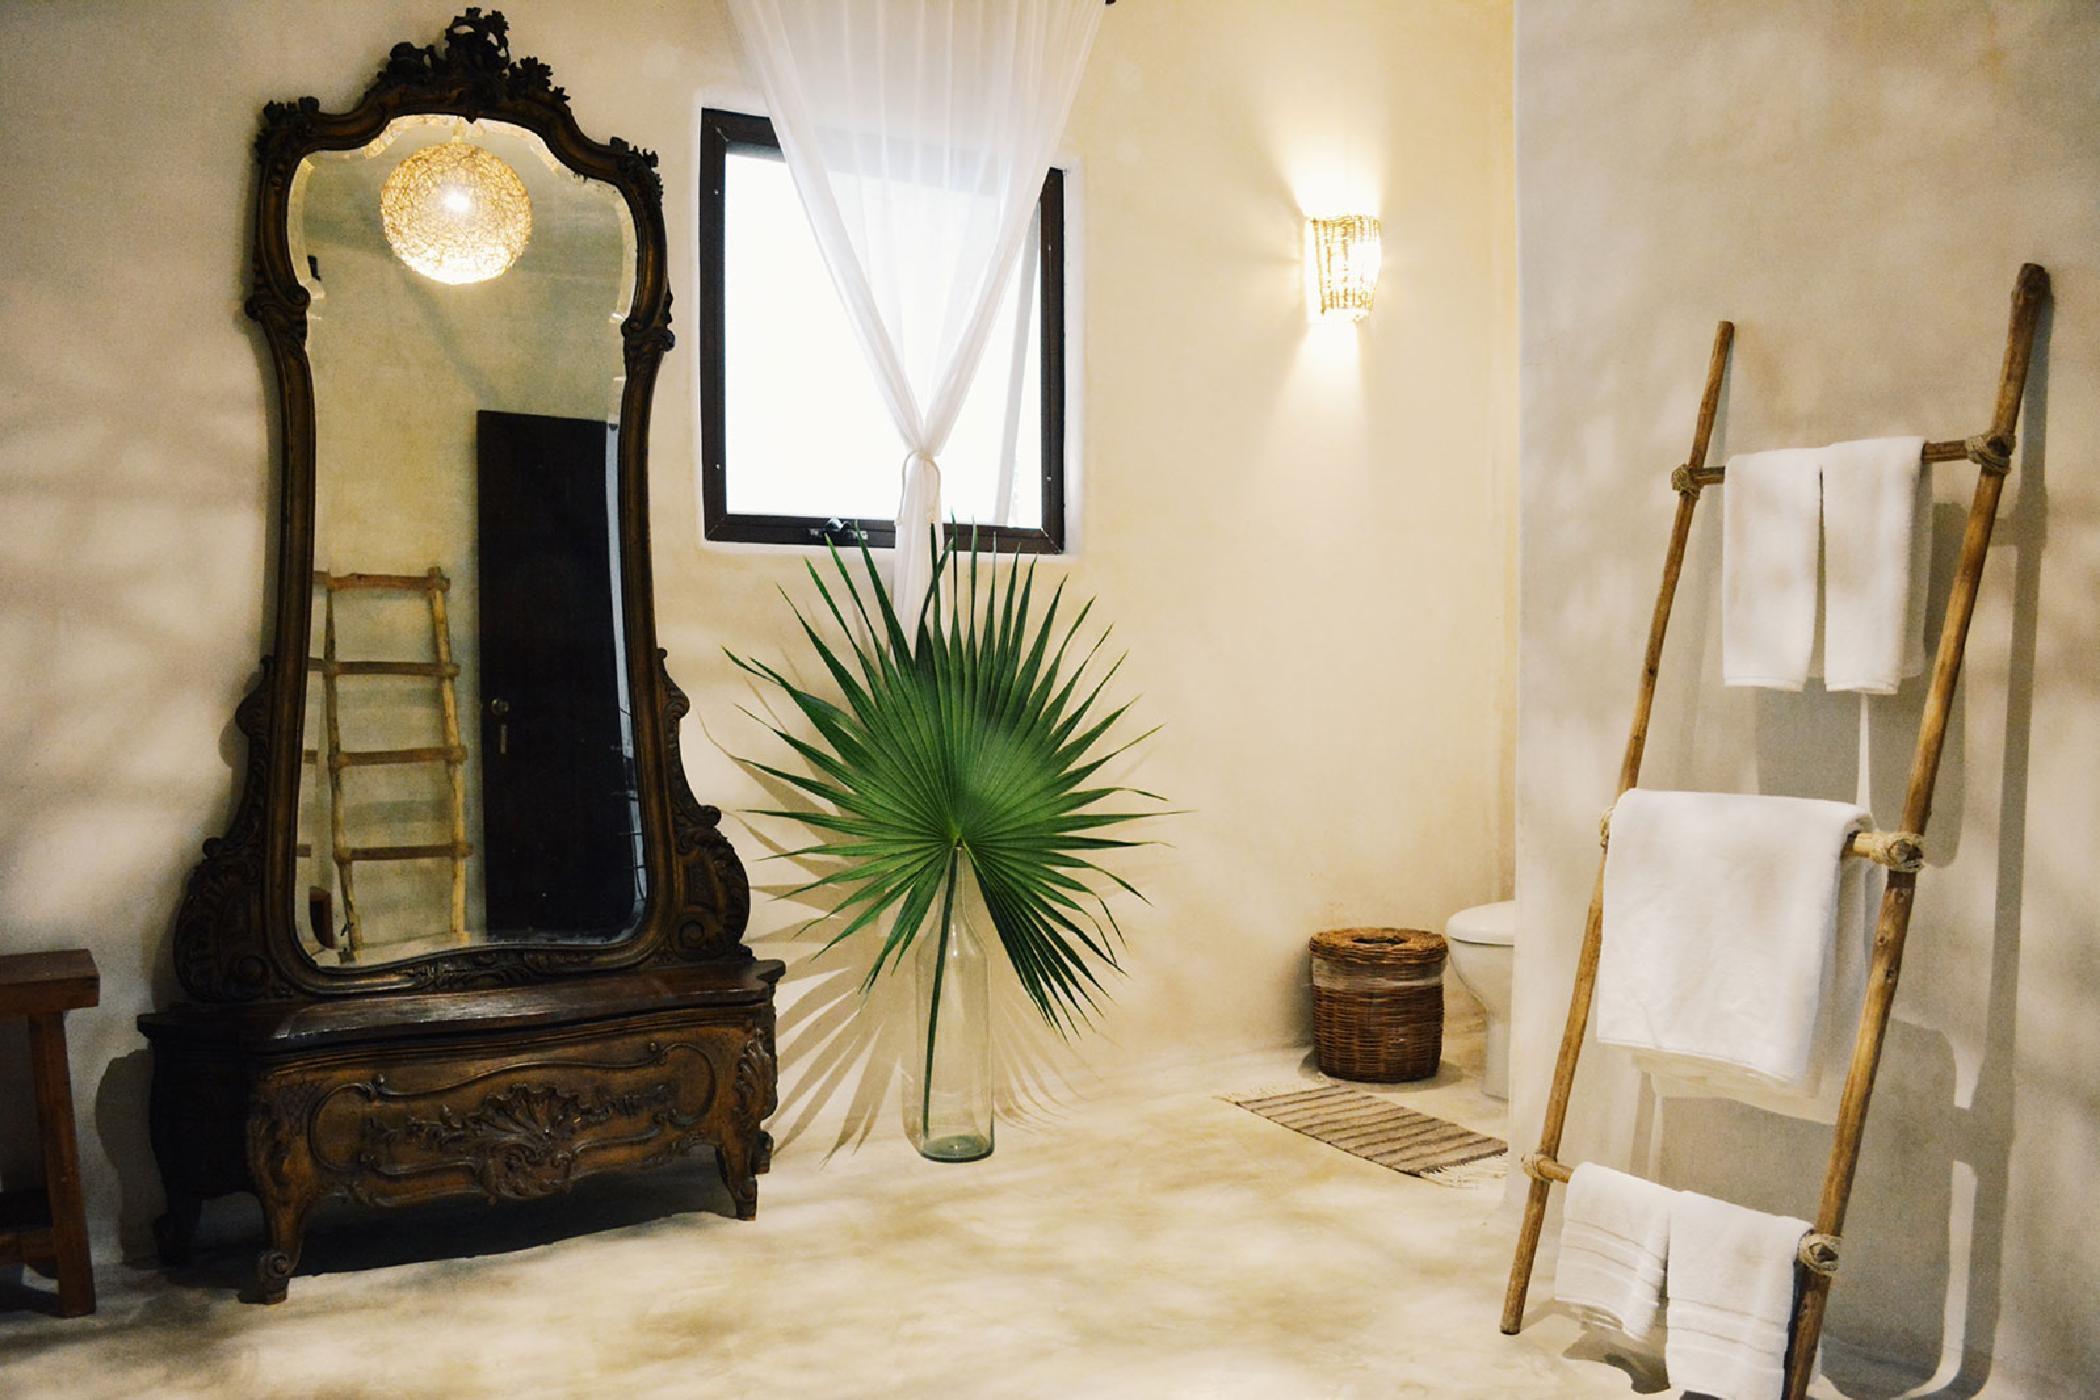 Maya_Luxe_Riviera_Maya_Luxury_Villas_Experiences_Hotel_Zone_Tulum_Beach_5_Bedrooms_Casa_Palapa_18.jpg